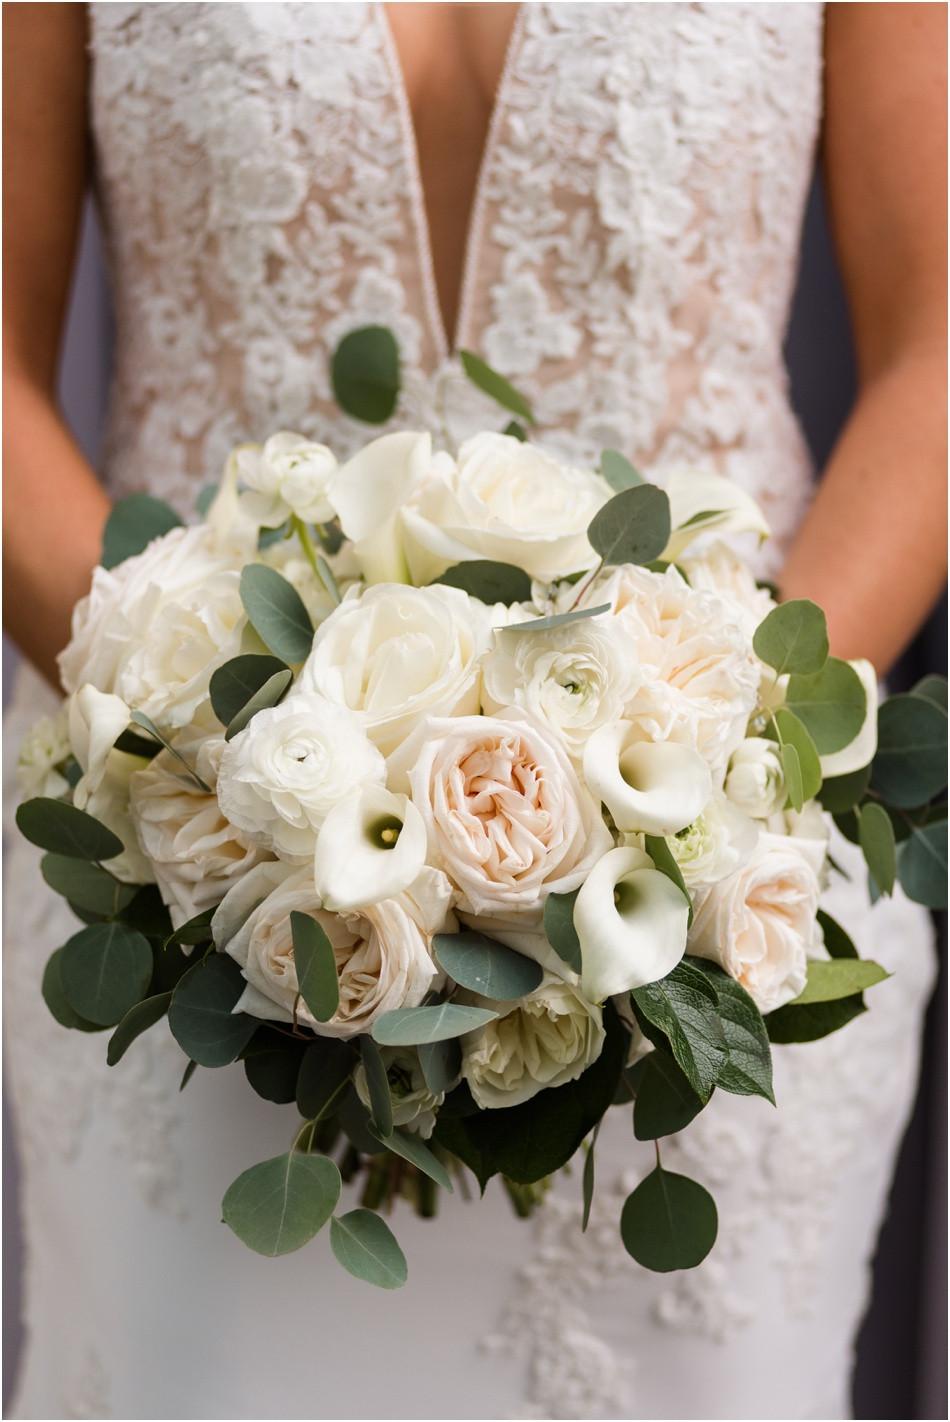 Bridal-bouquet-ideas-indianapolis